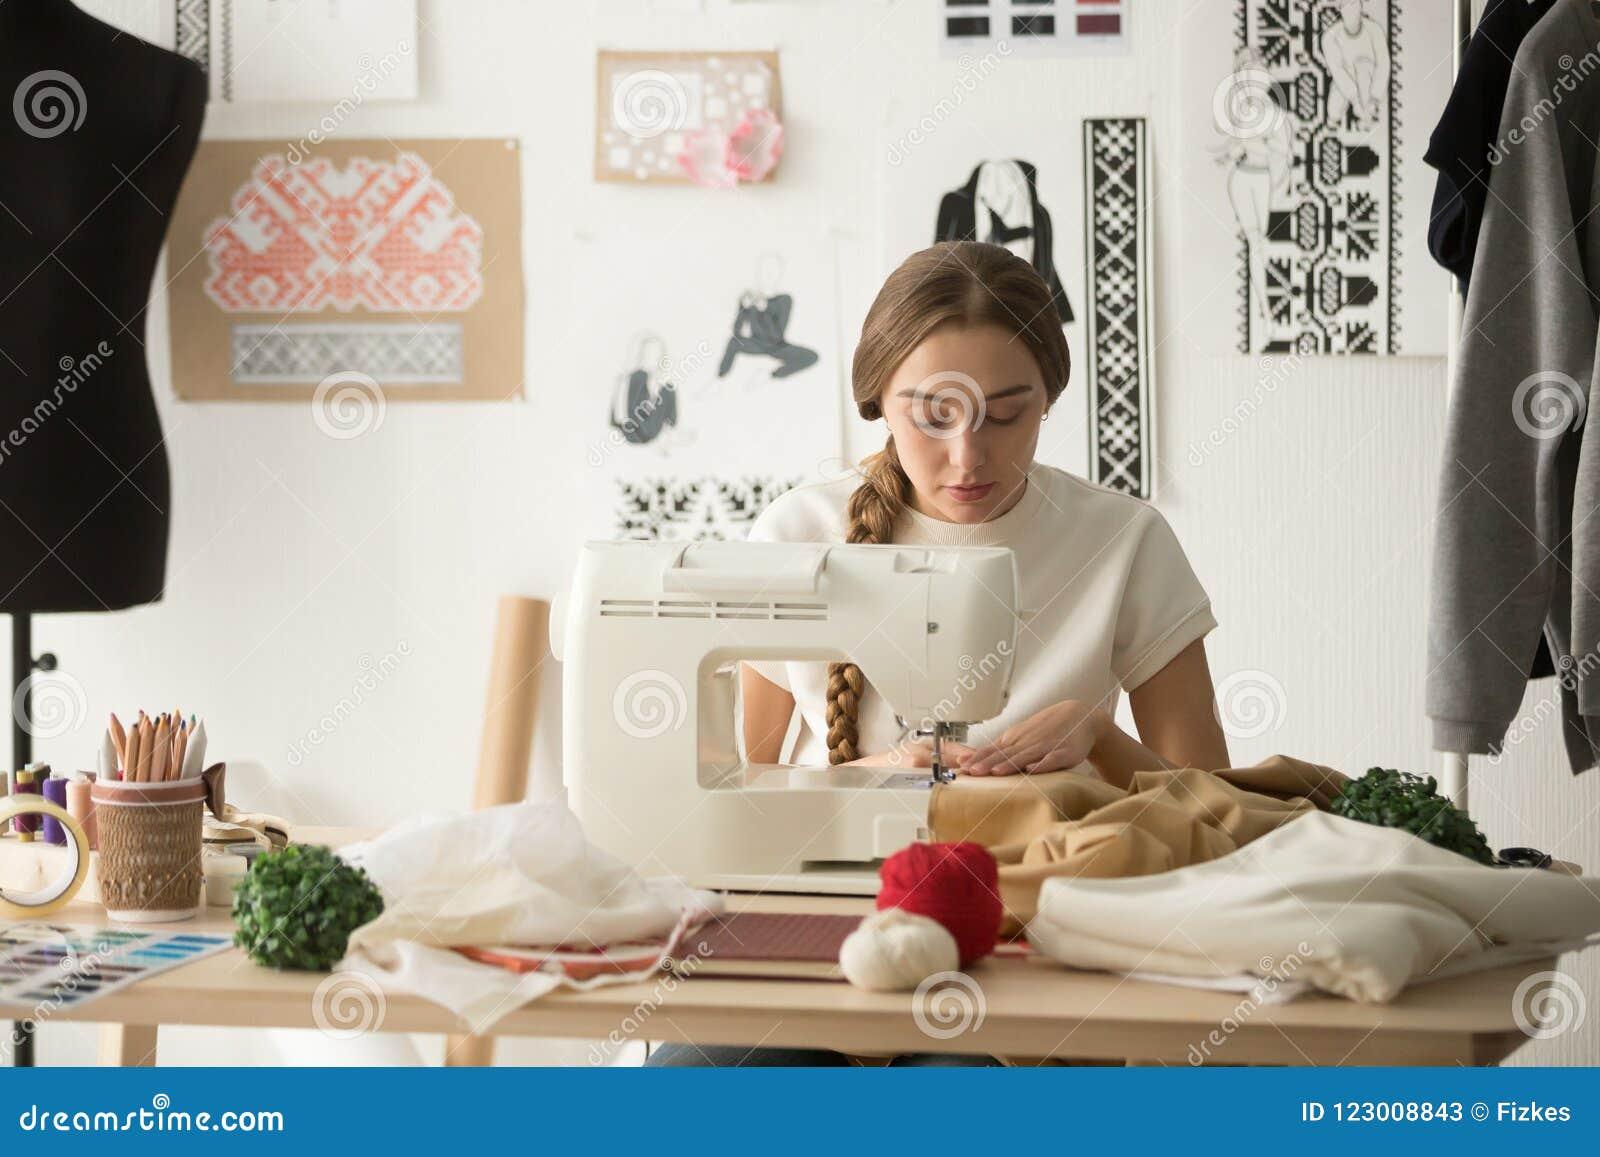 Clothing Design Studio | Female Tailor Stitching On Sewing Machine In Design Studio Stock